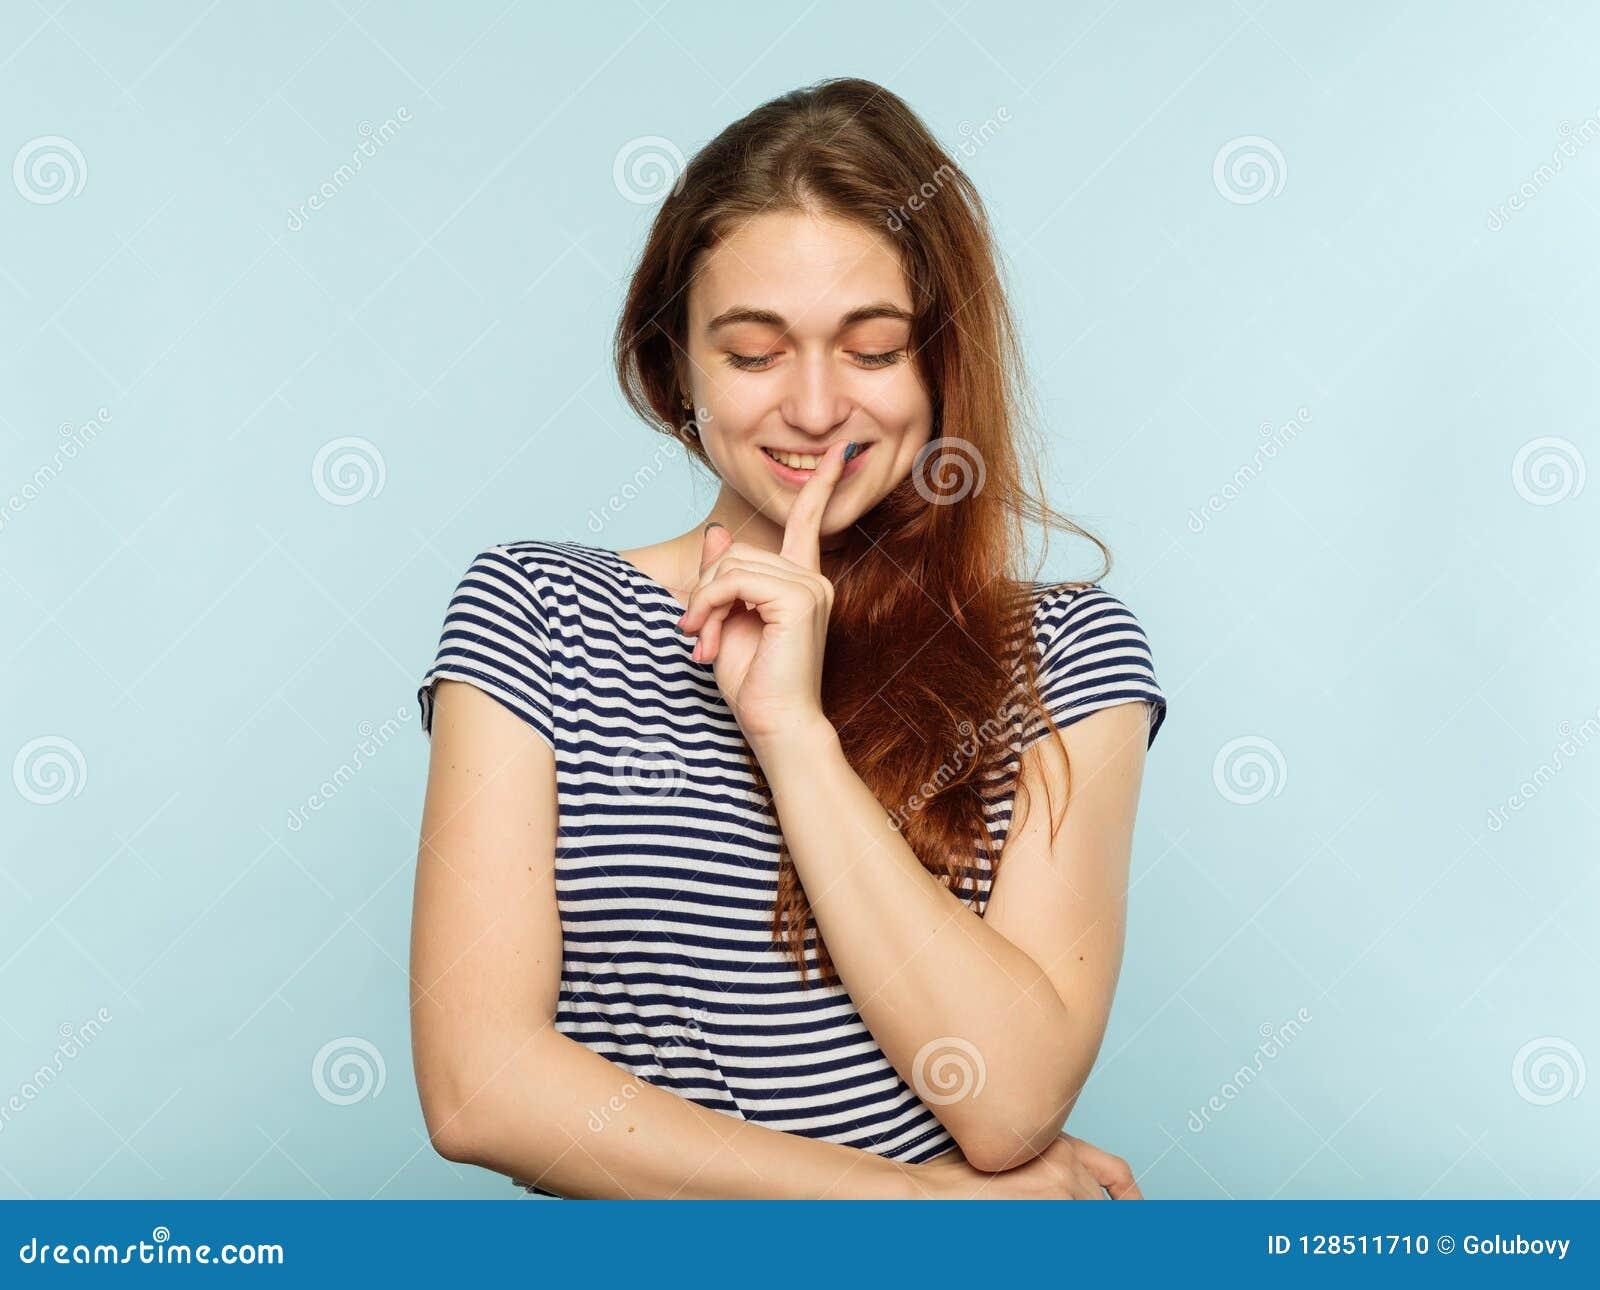 Coquettish attractive girl secret finger on lips